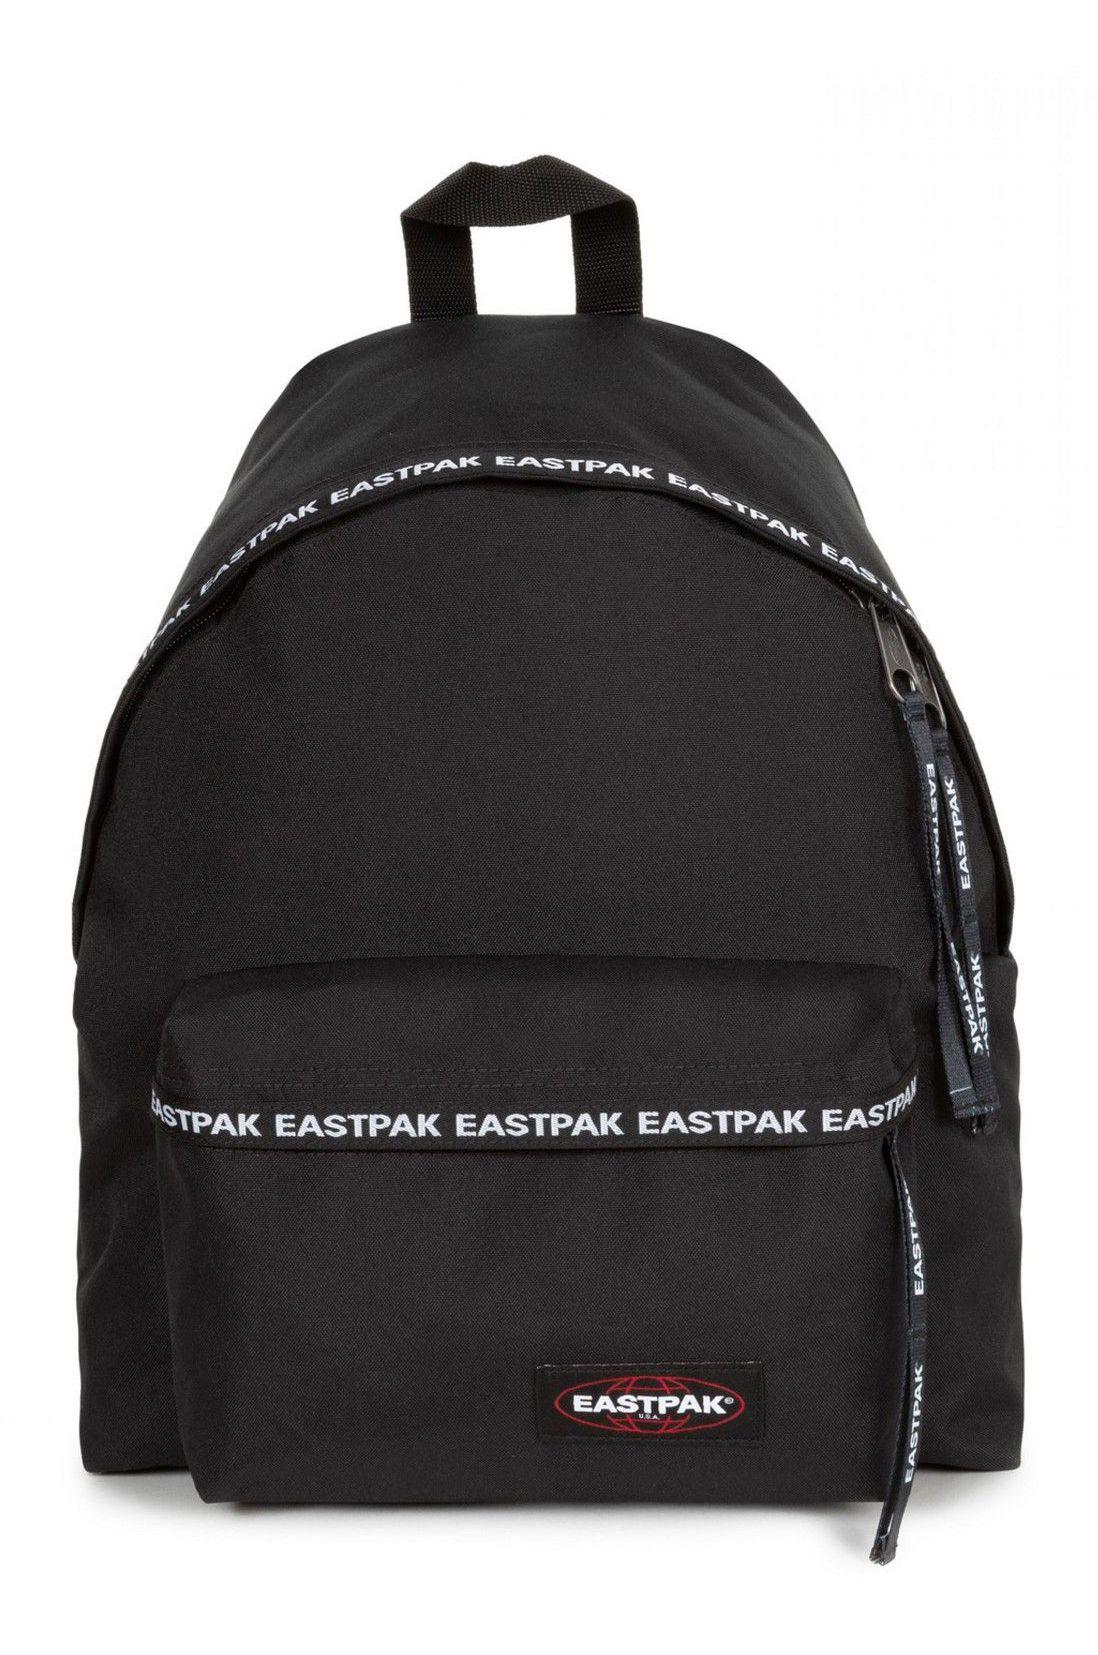 Eastpak Backpack PADDED PAK'R Bold Puller Black